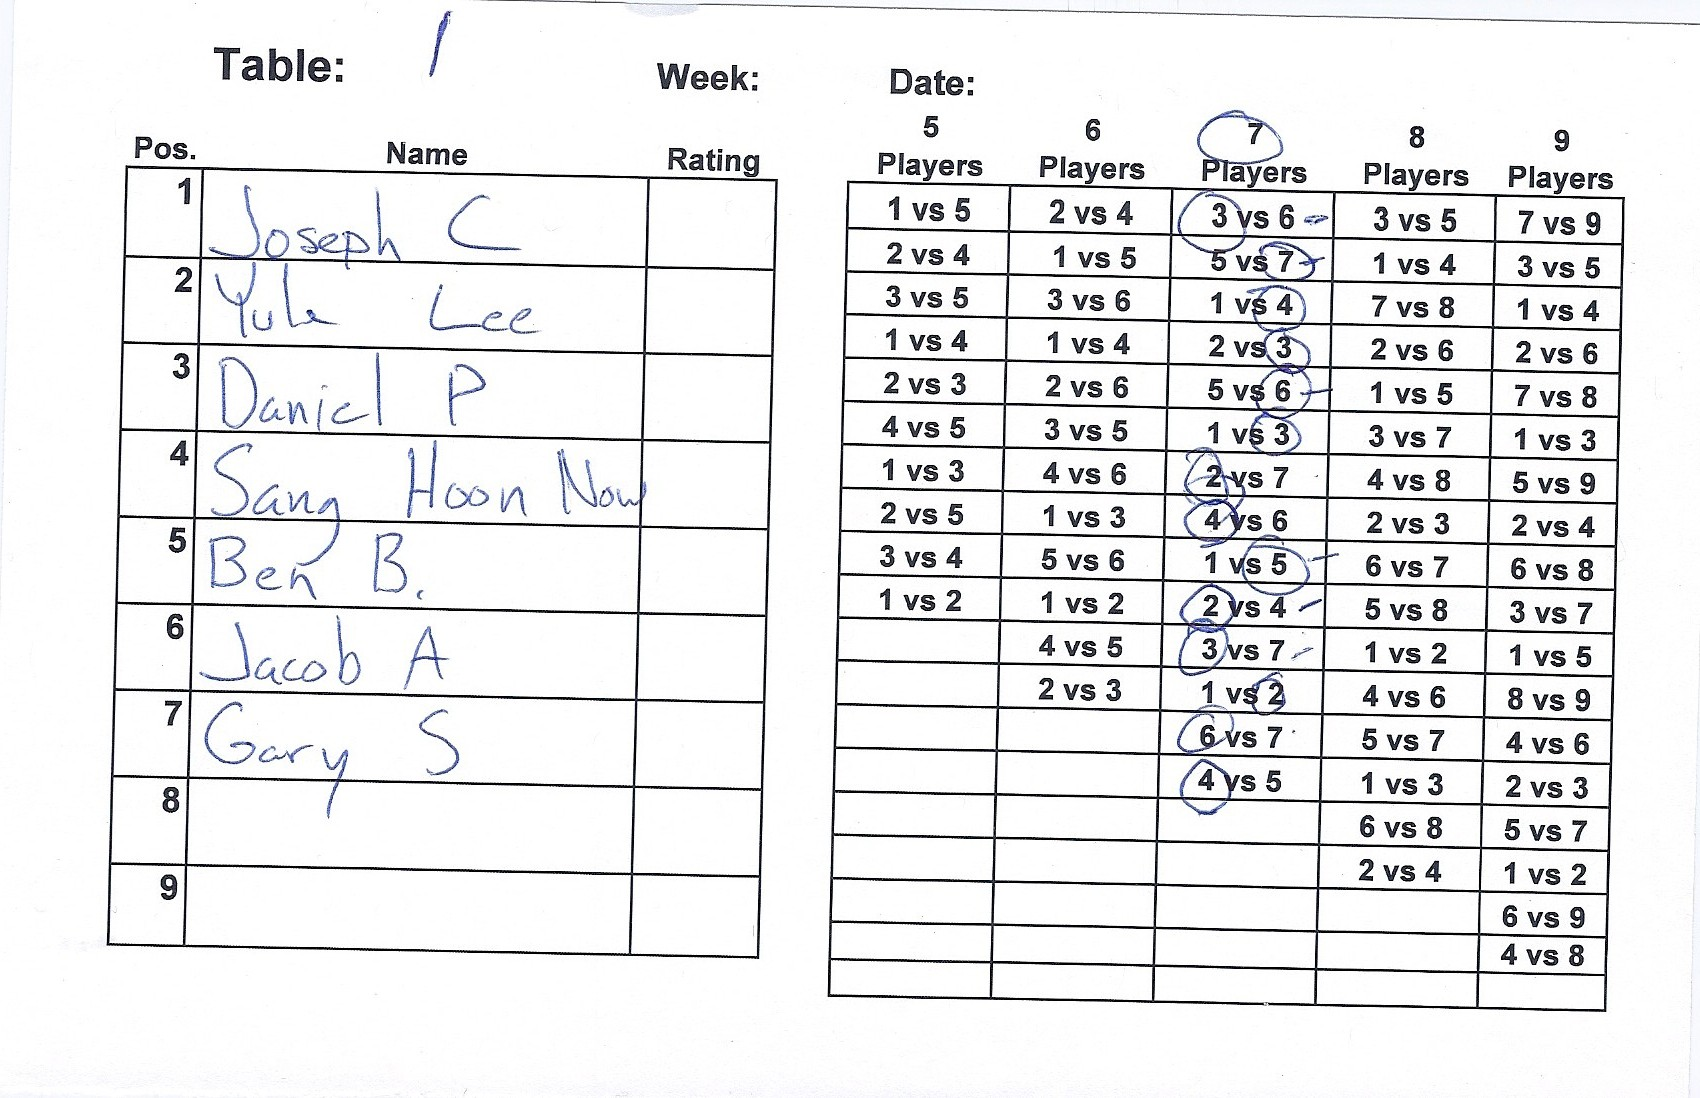 Week 10 League Results Summer/Fall 2011